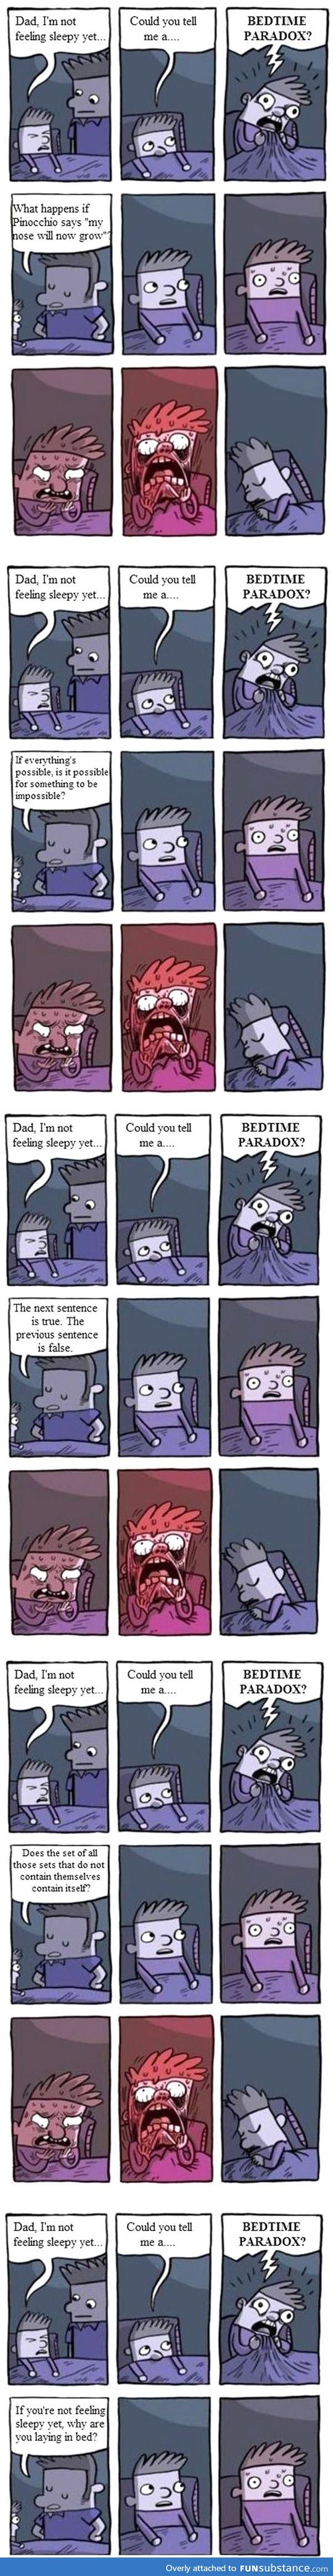 Bedtime paradox compilation @xlisacavex